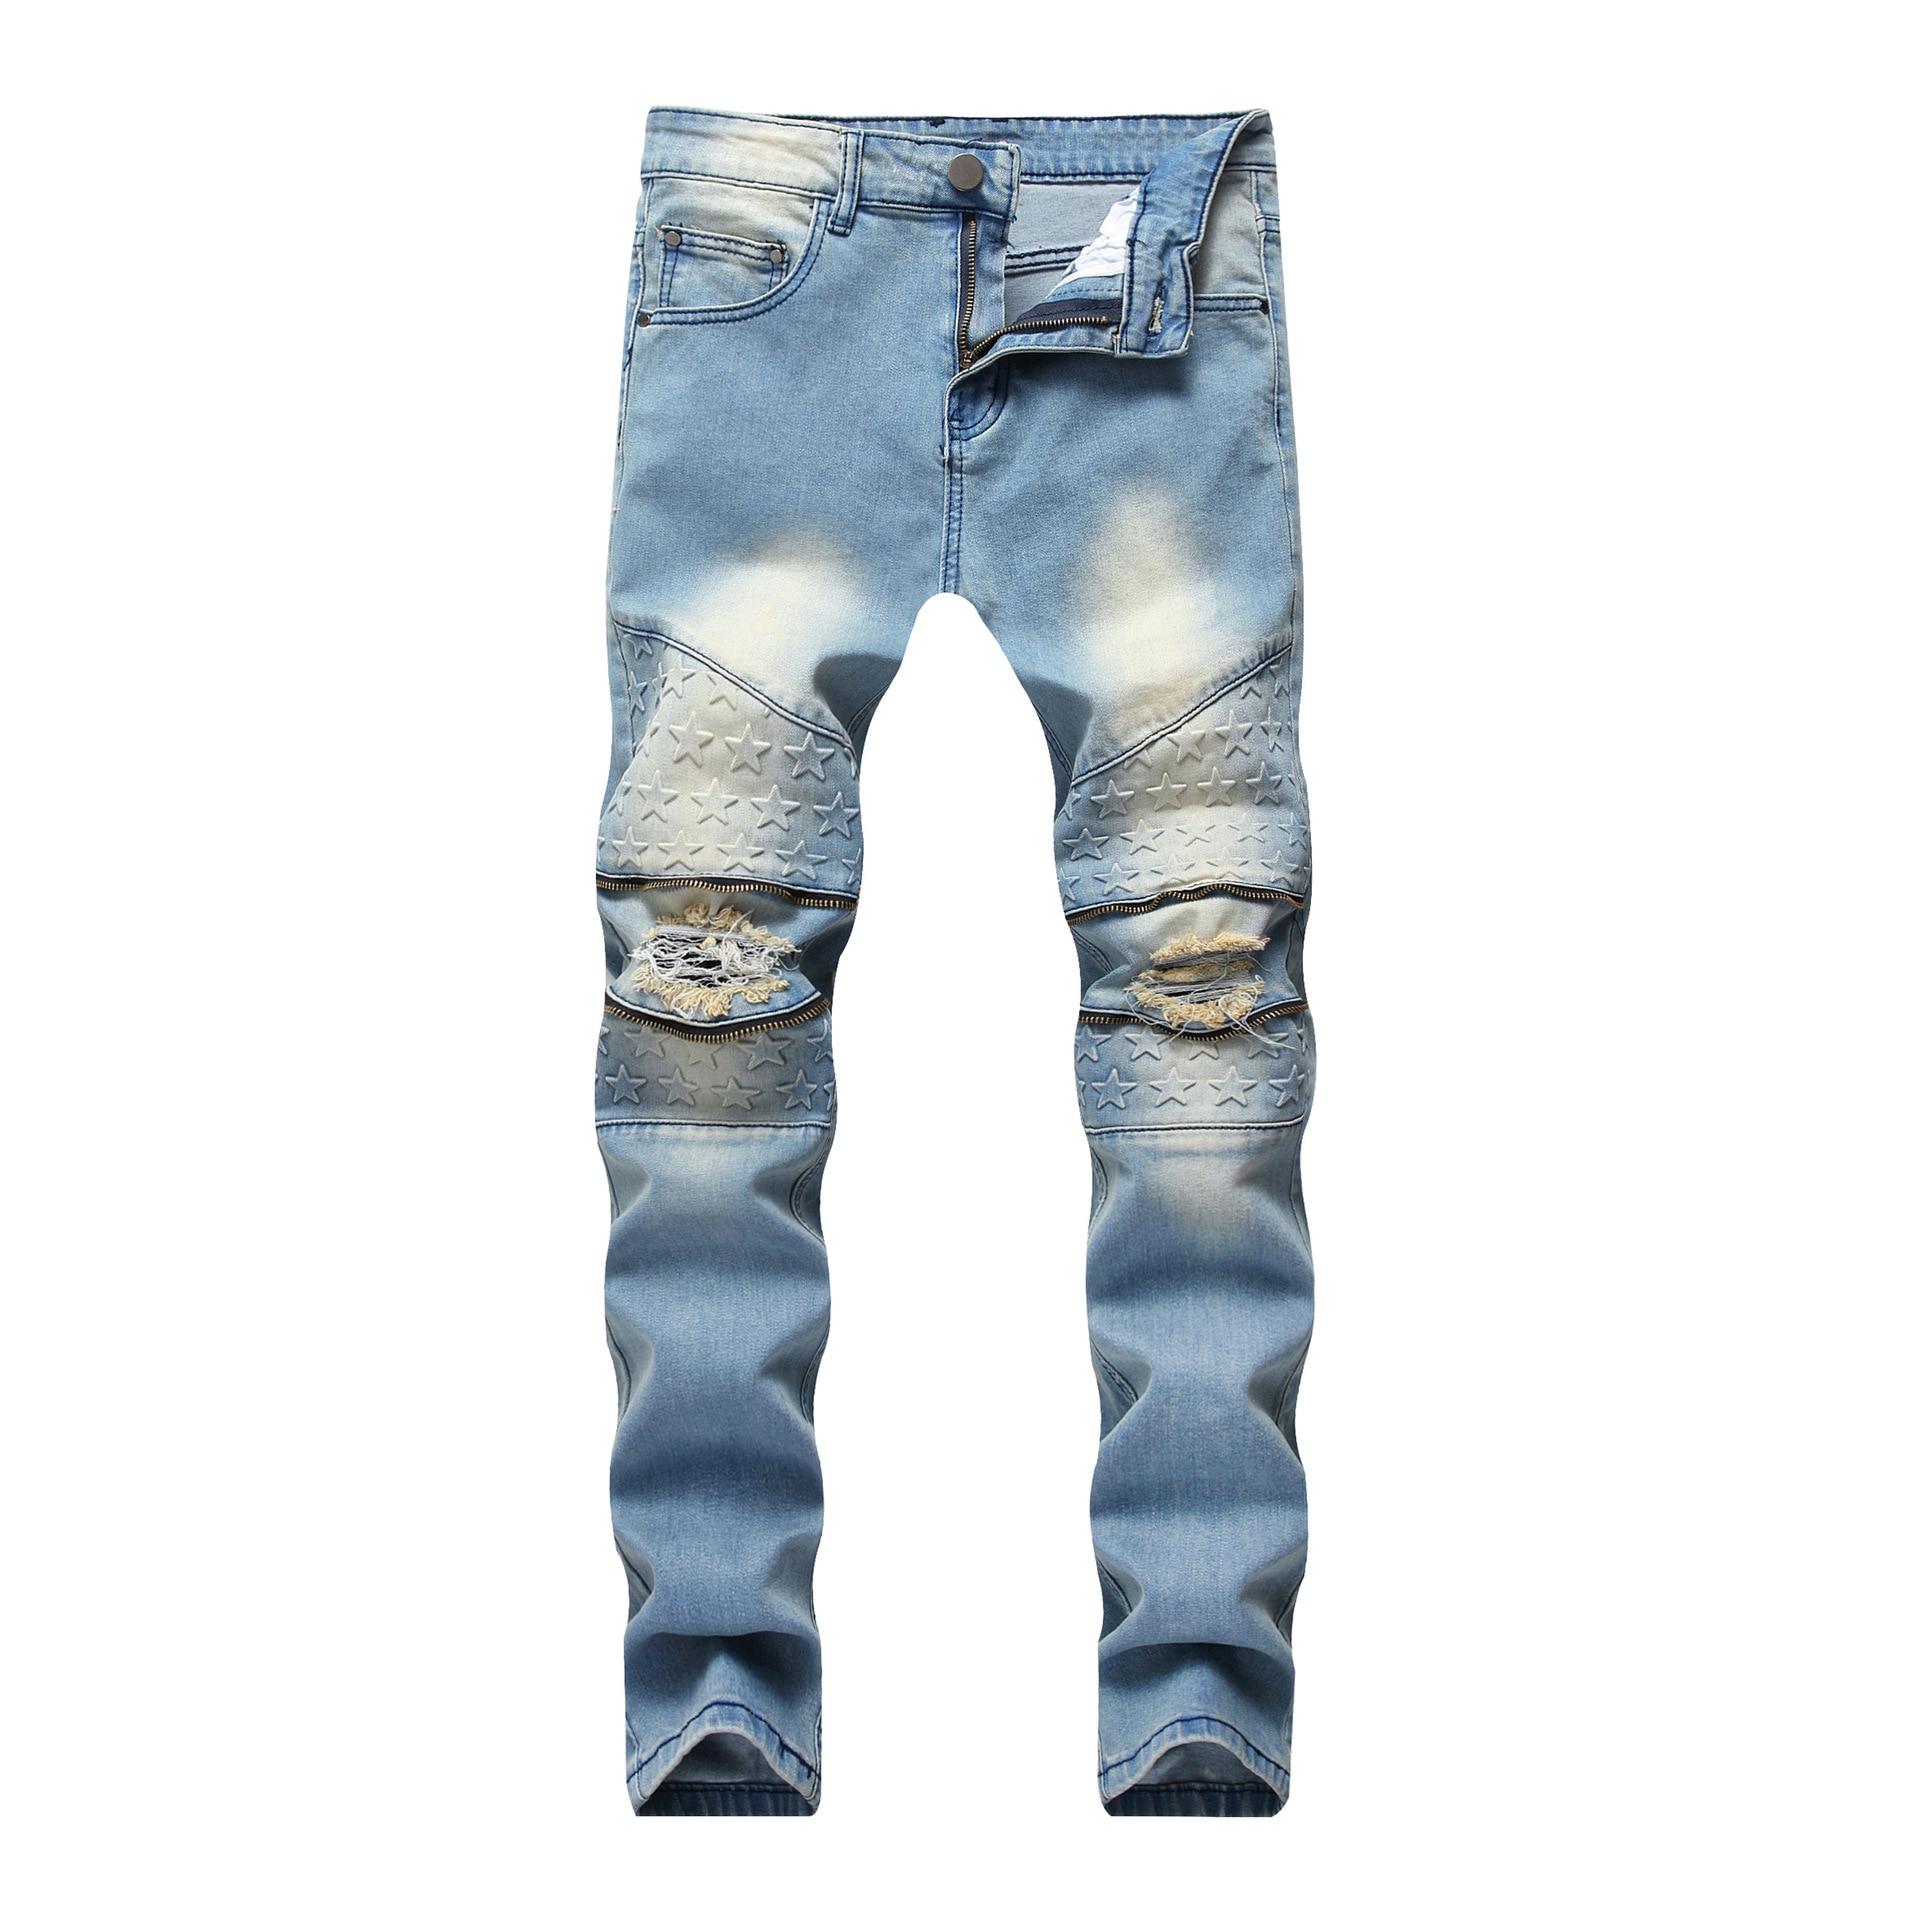 Mens Fashion Zipper Stretch Jeans Light Blue Knee Hole Straight Jeans Trousers Denim Slim Fit Ripped Hi-Street Distressed Pants